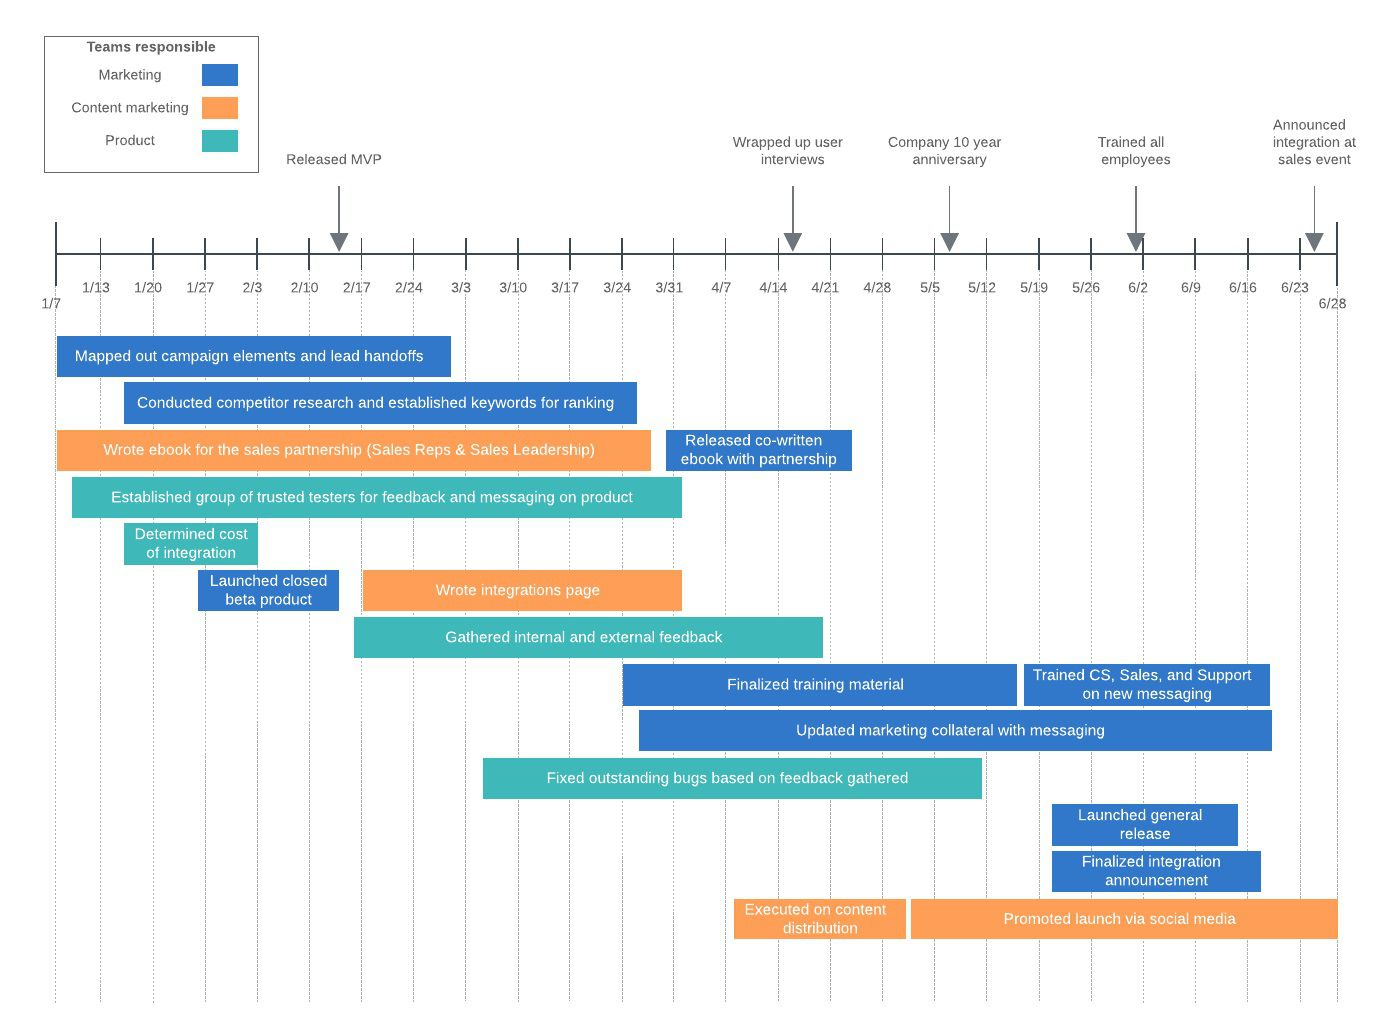 007 Stunning Google Doc Timeline Template Example  HistoricalFull